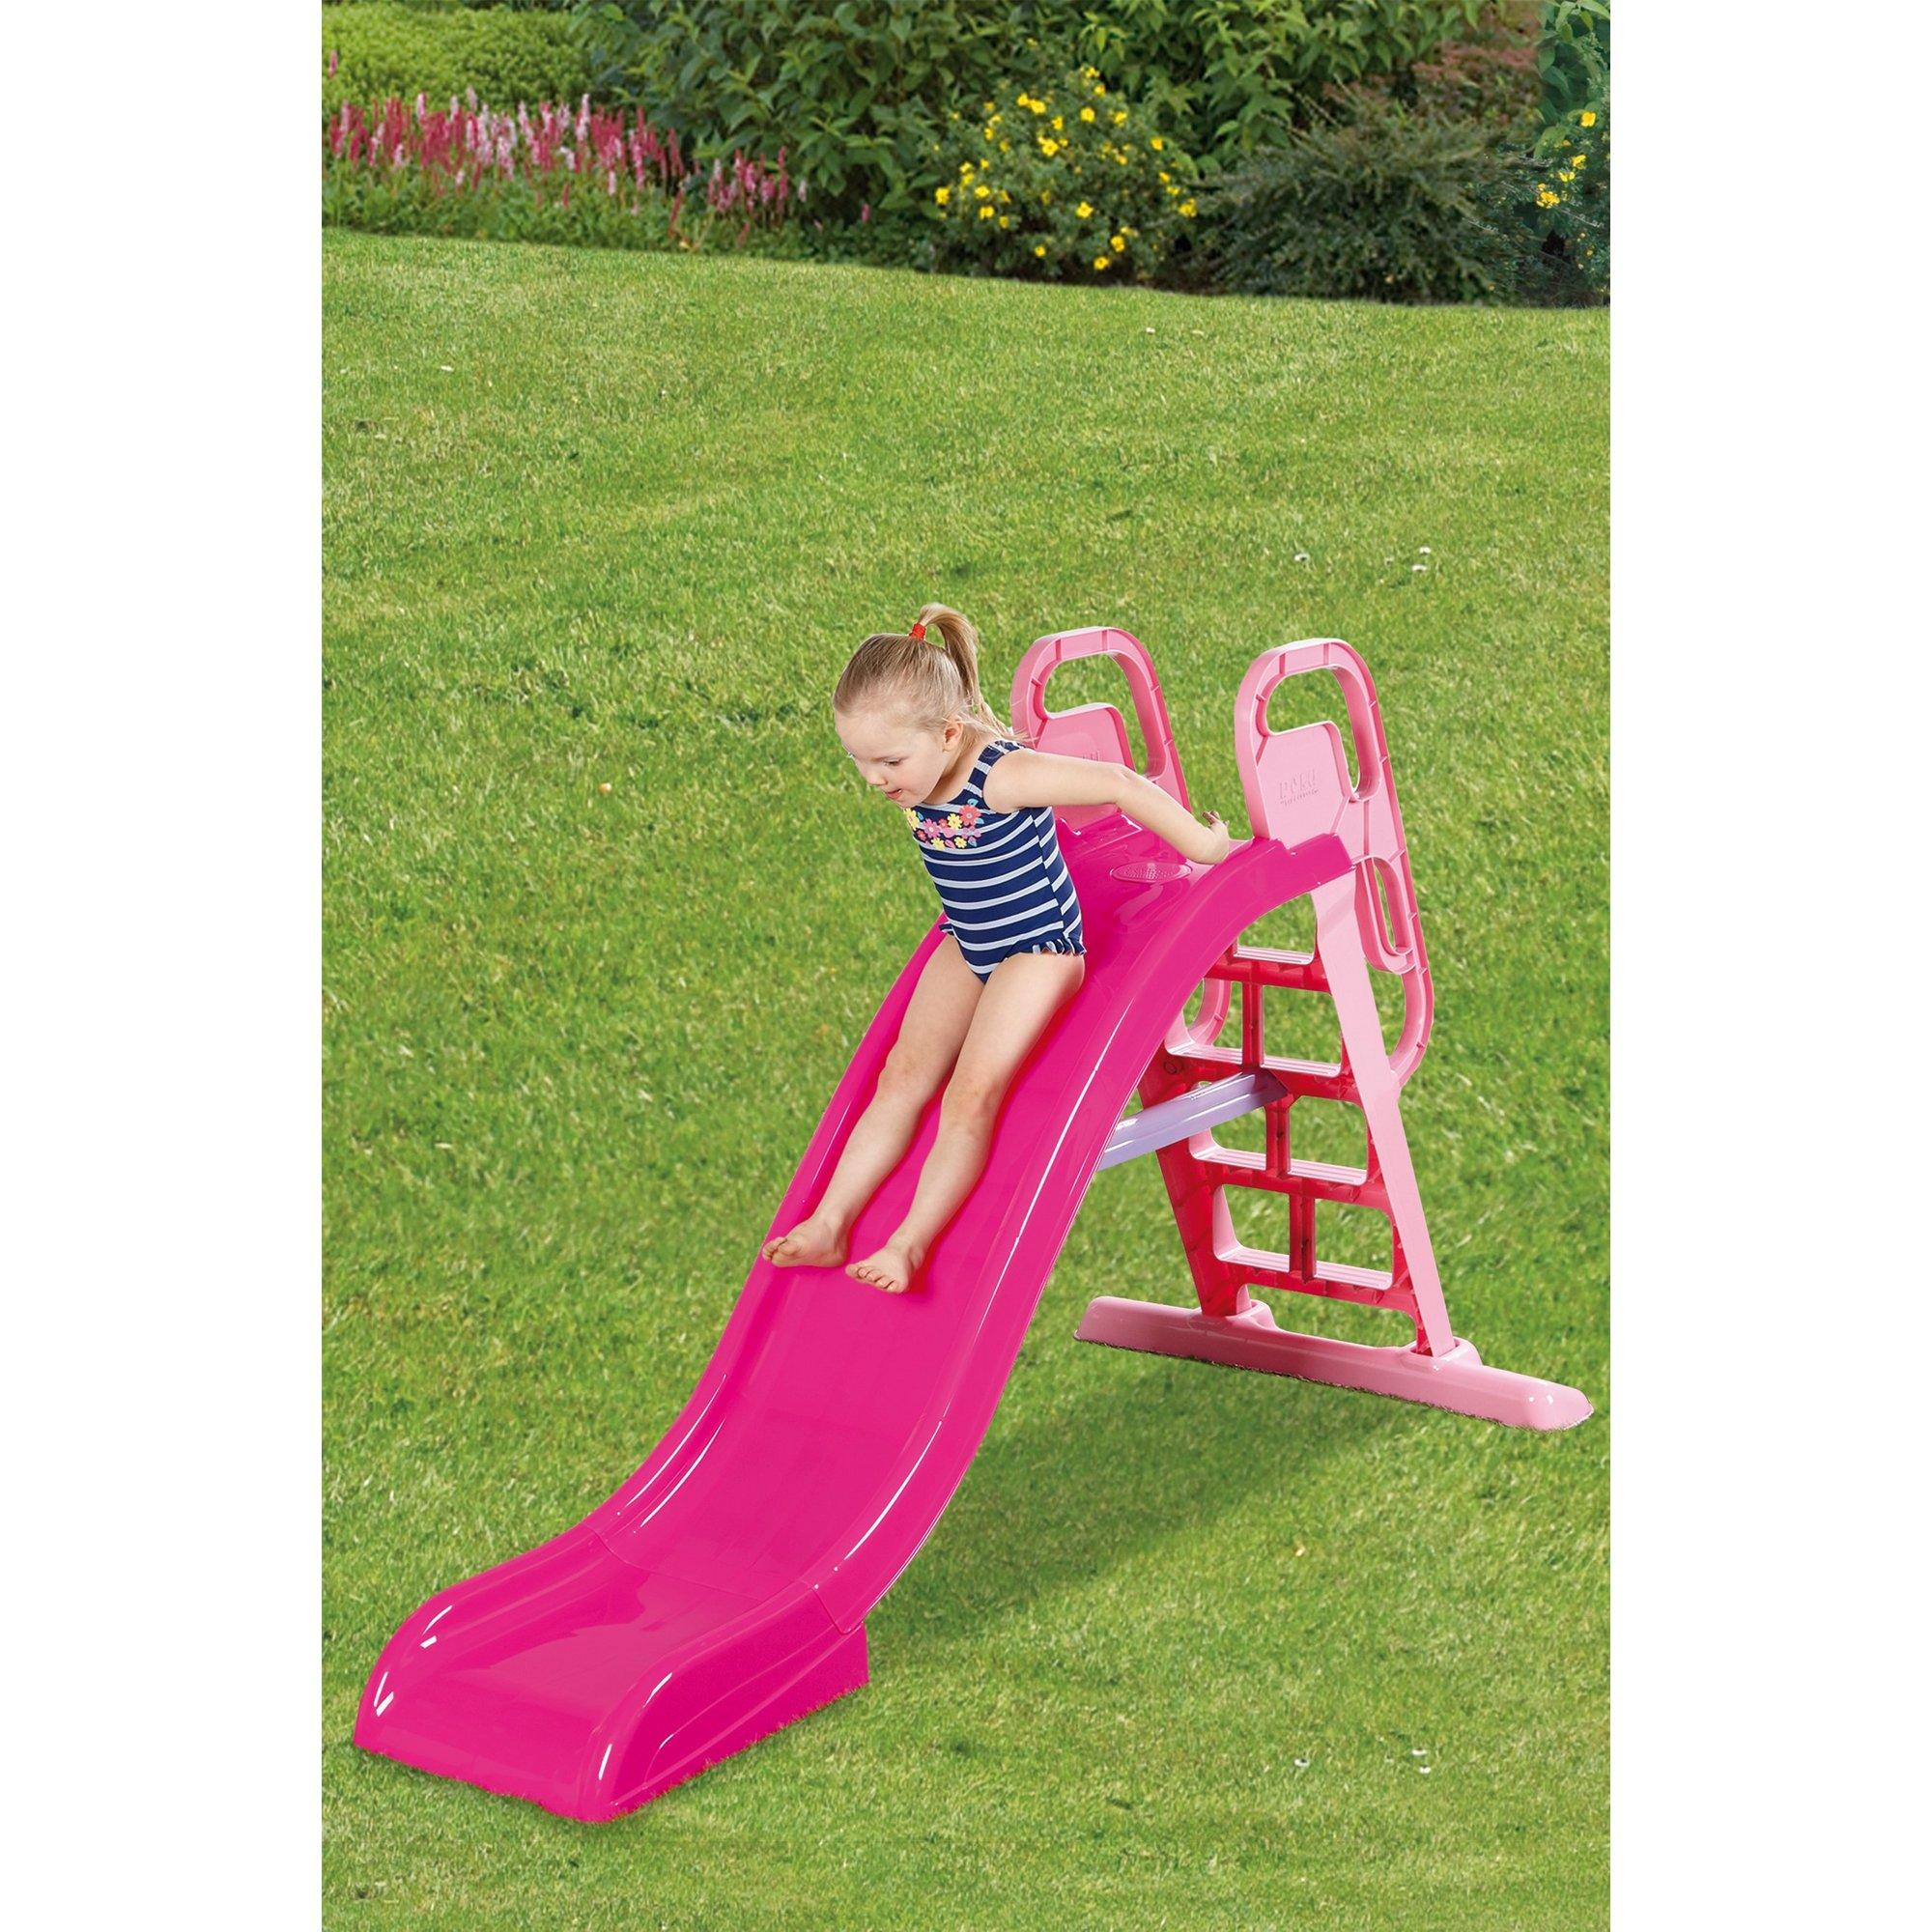 Image of 2-In-1 6.5ft Pink Wavy Slide with Water Sprinkler